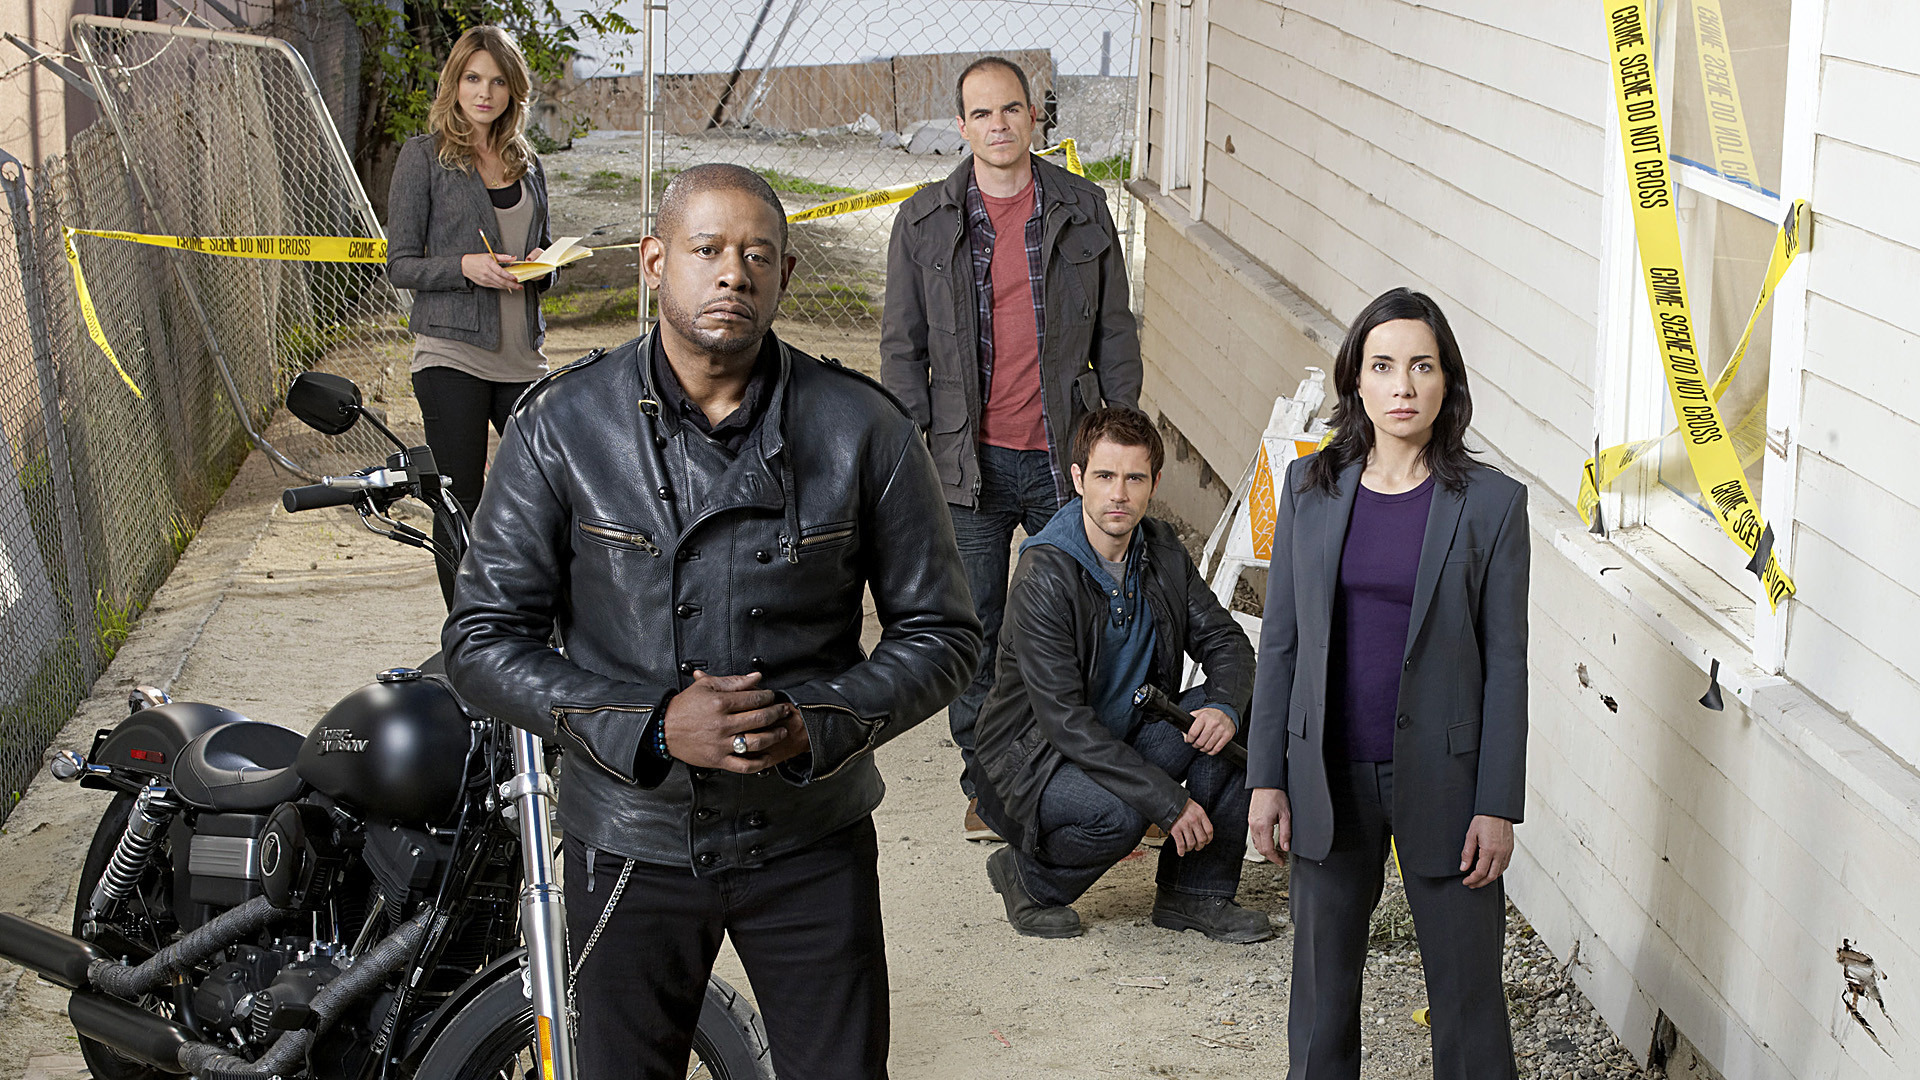 Show Criminal Minds: Suspect Behavior